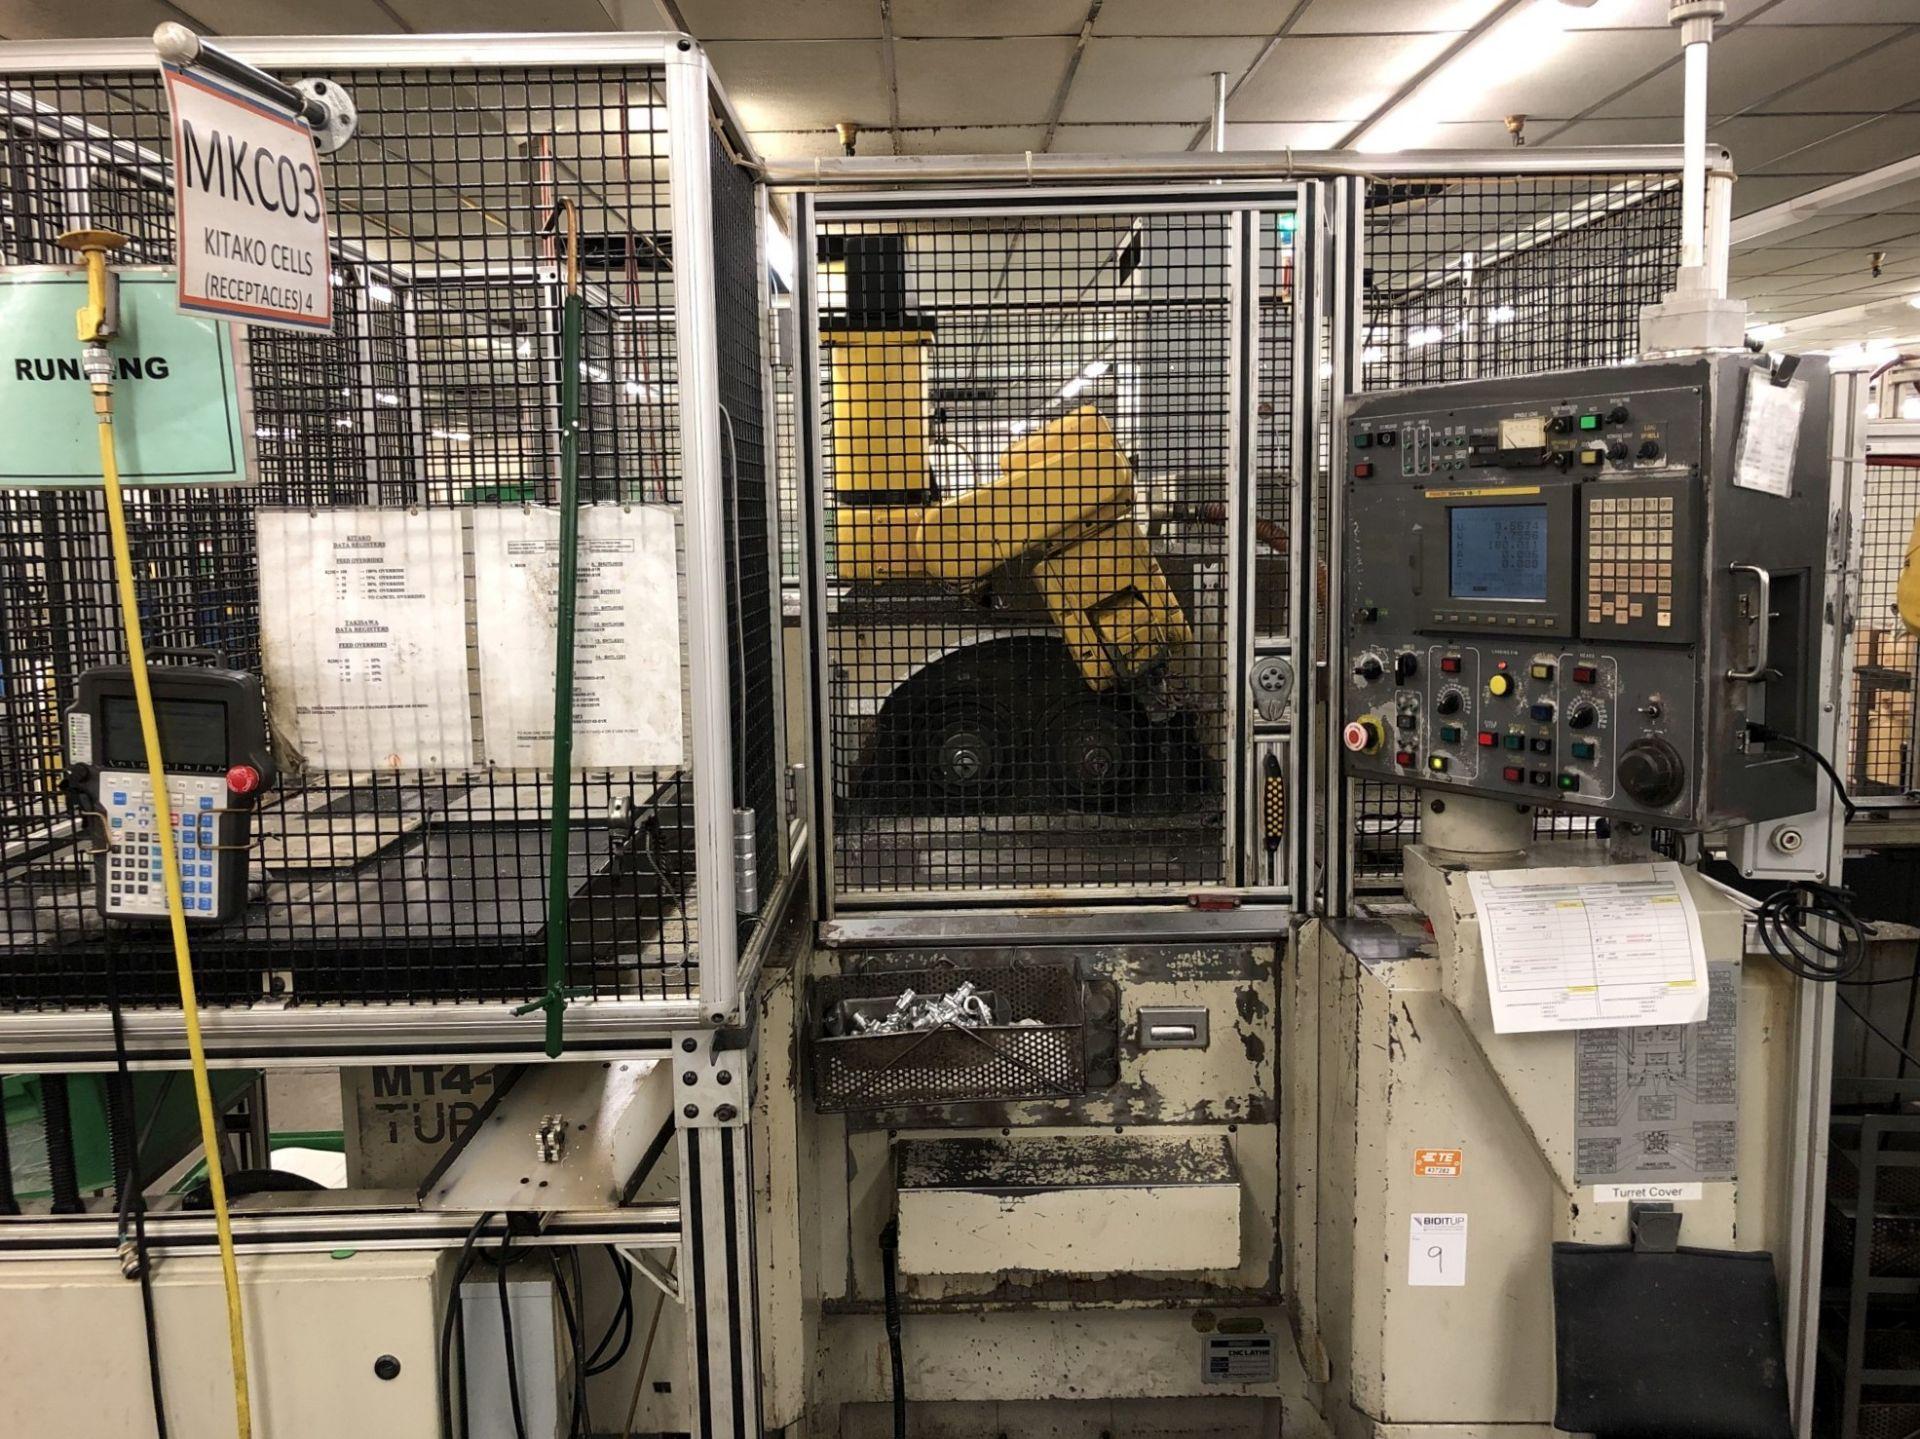 1999 Kitako MT4-200M Multi-Spindle CNC Turning Mill - Image 3 of 19